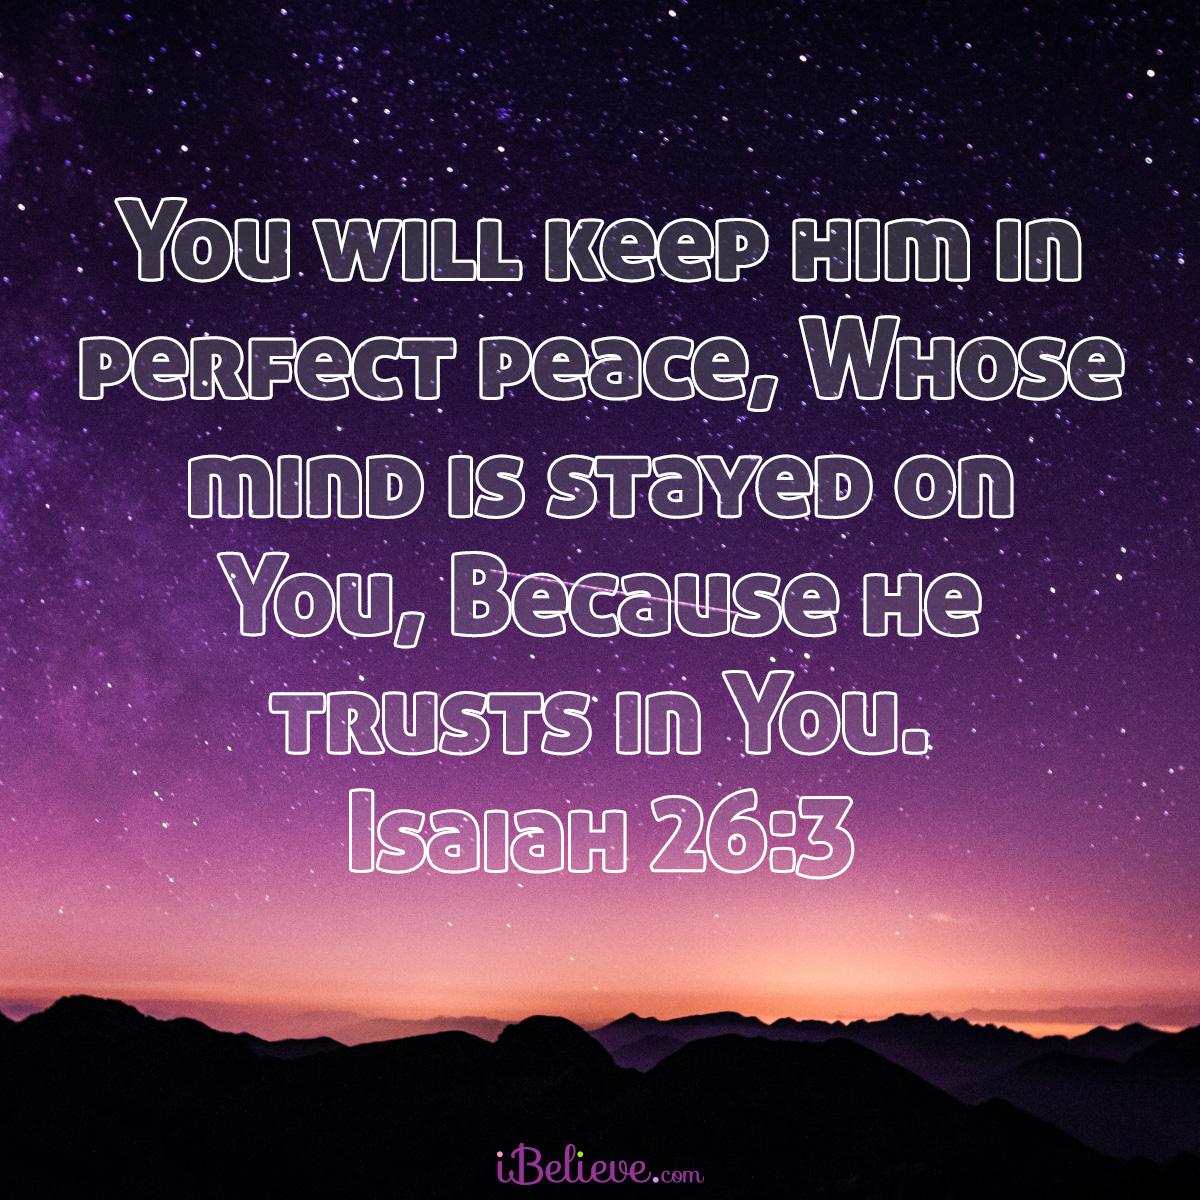 Isaiah 26:3, inspirational image